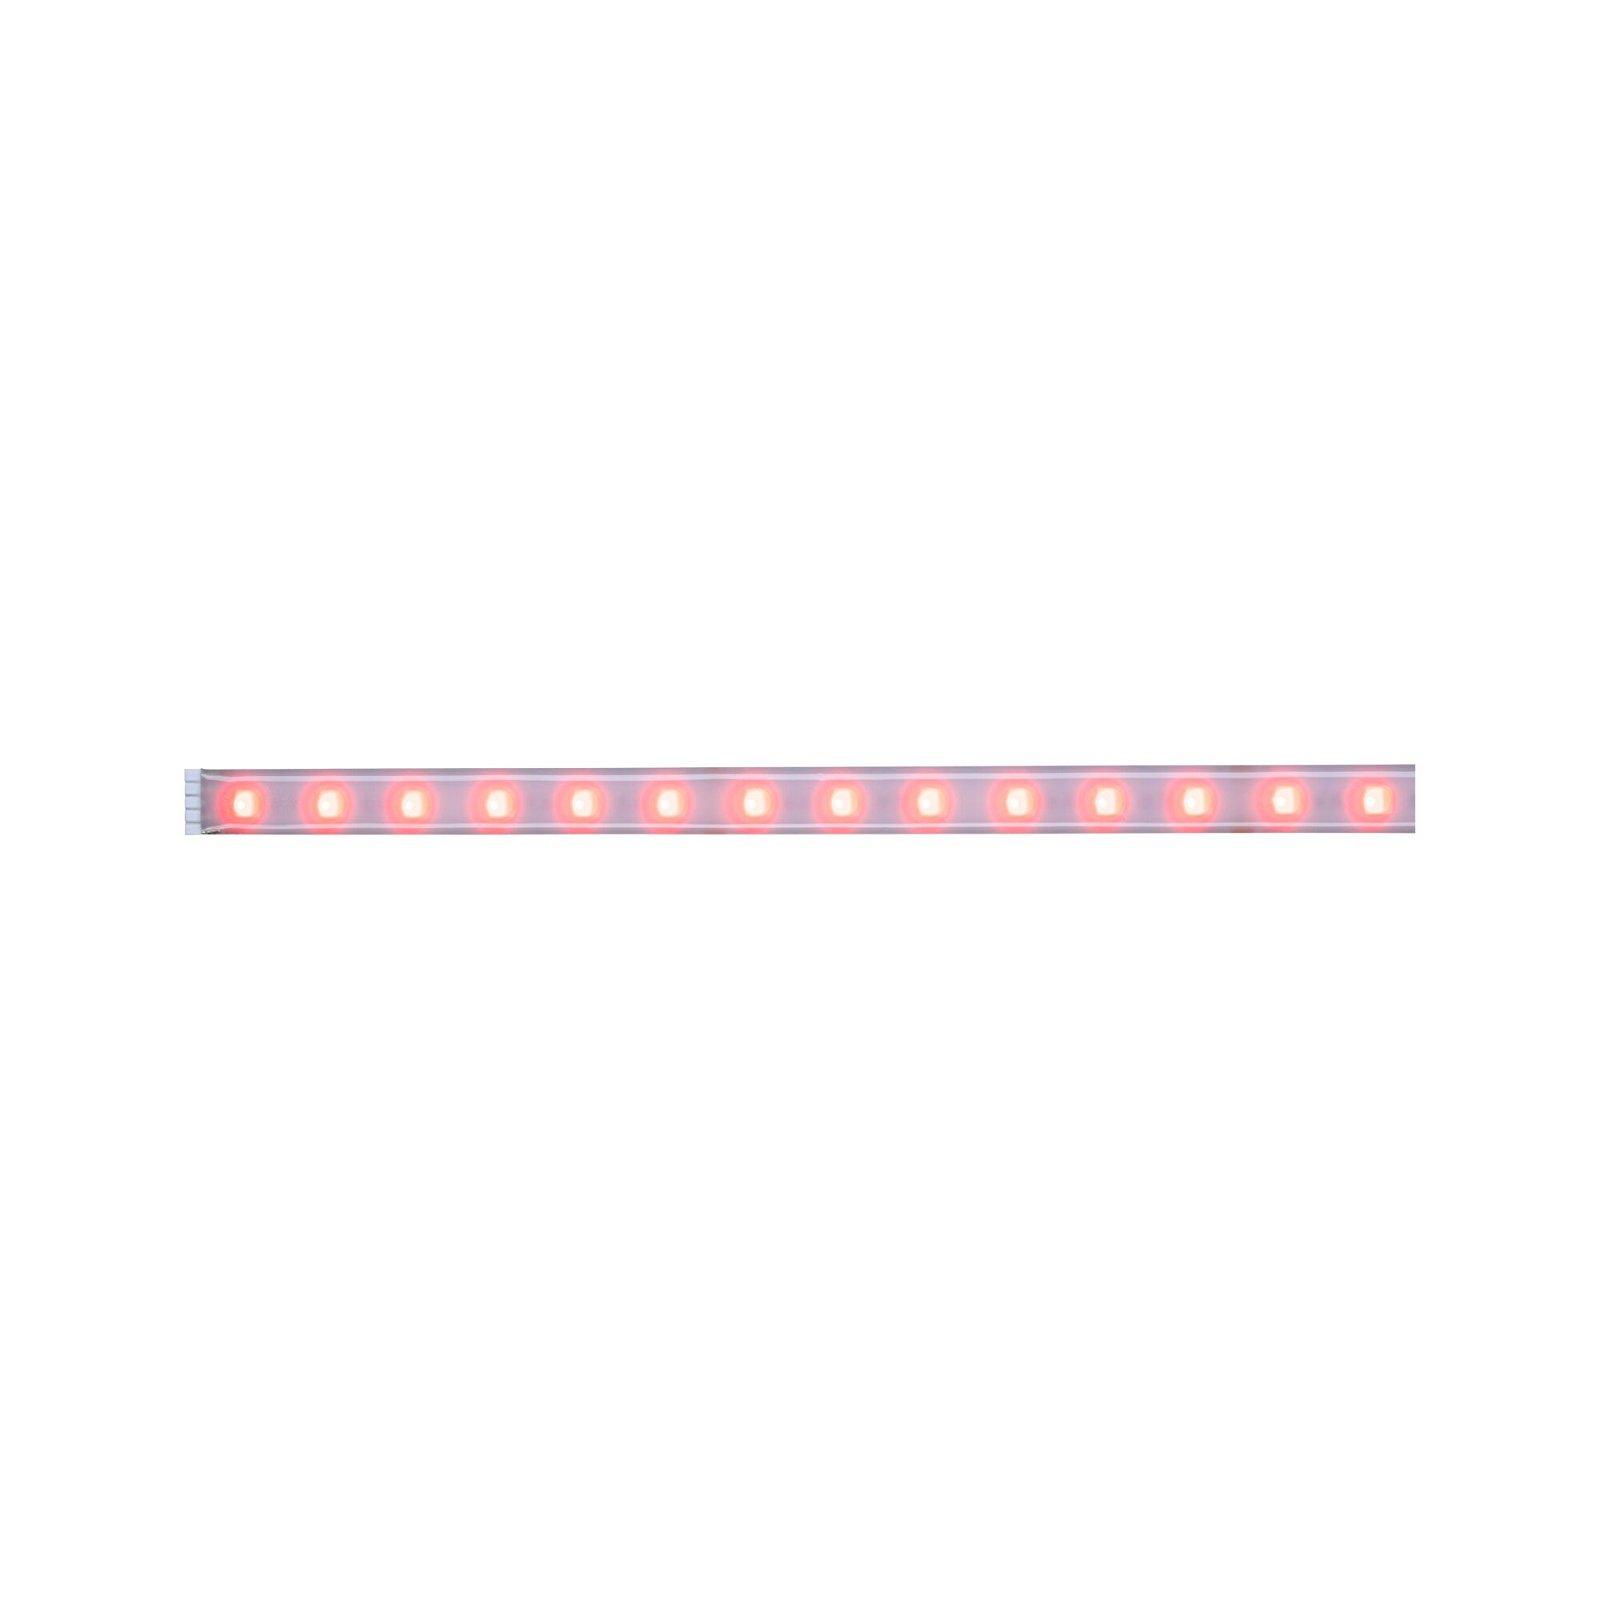 MaxLED 500 Strip LED RGBW 1m recouvert 12W 500lm RGBW